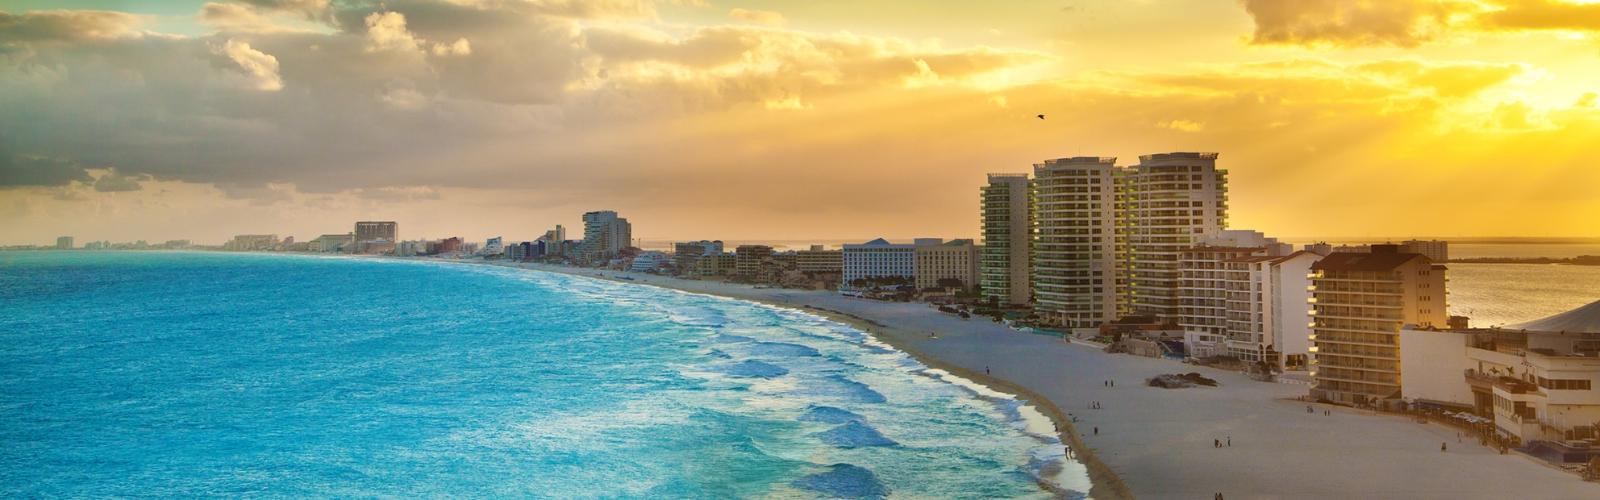 Cancun Holidays 2020 2021 Cancun All Inclusive Virgin Holidays